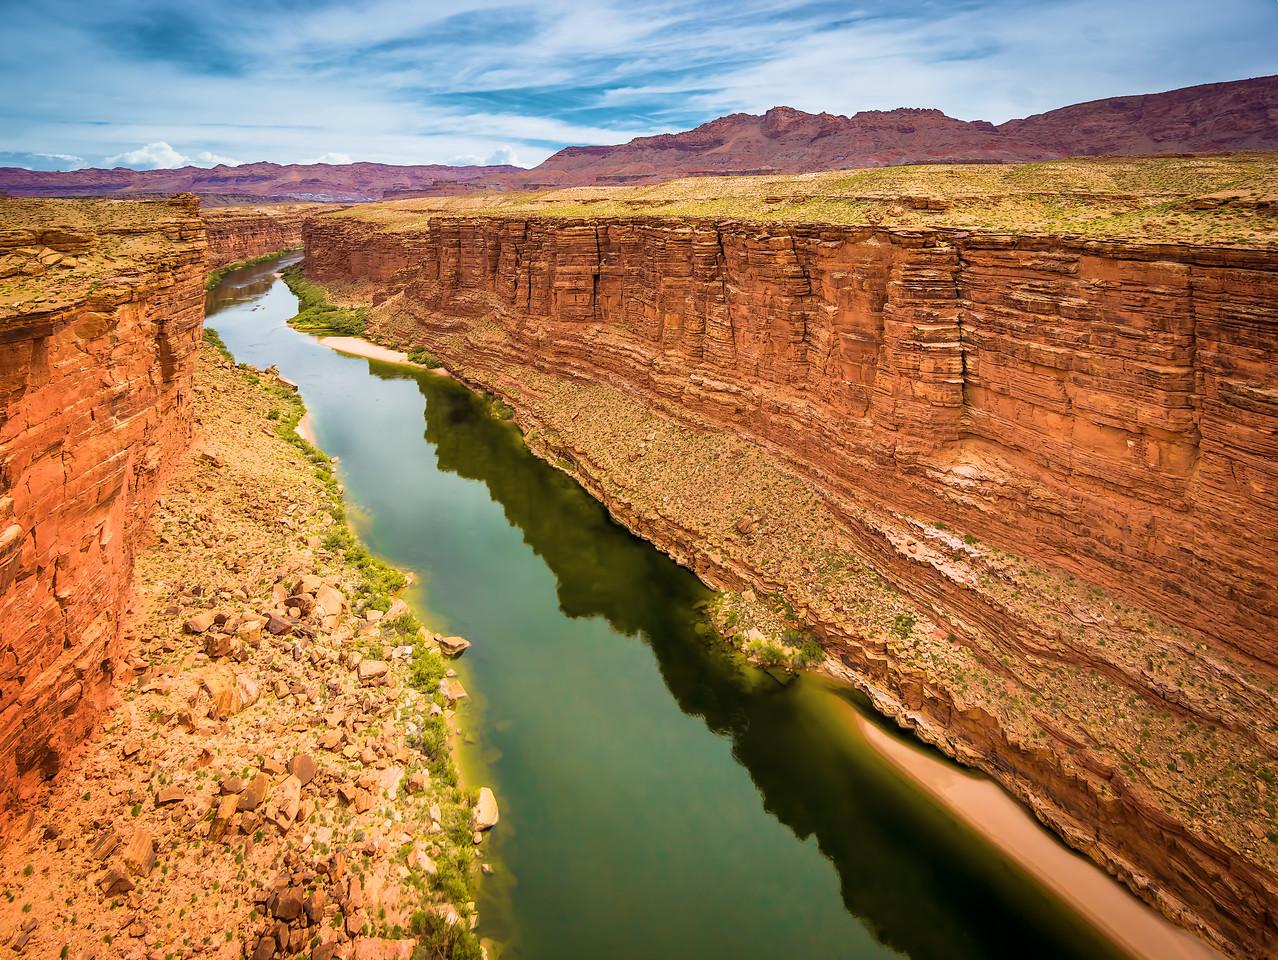 Travel_Photography_Blog_Arizona_Marble_Canyon_Green_Water